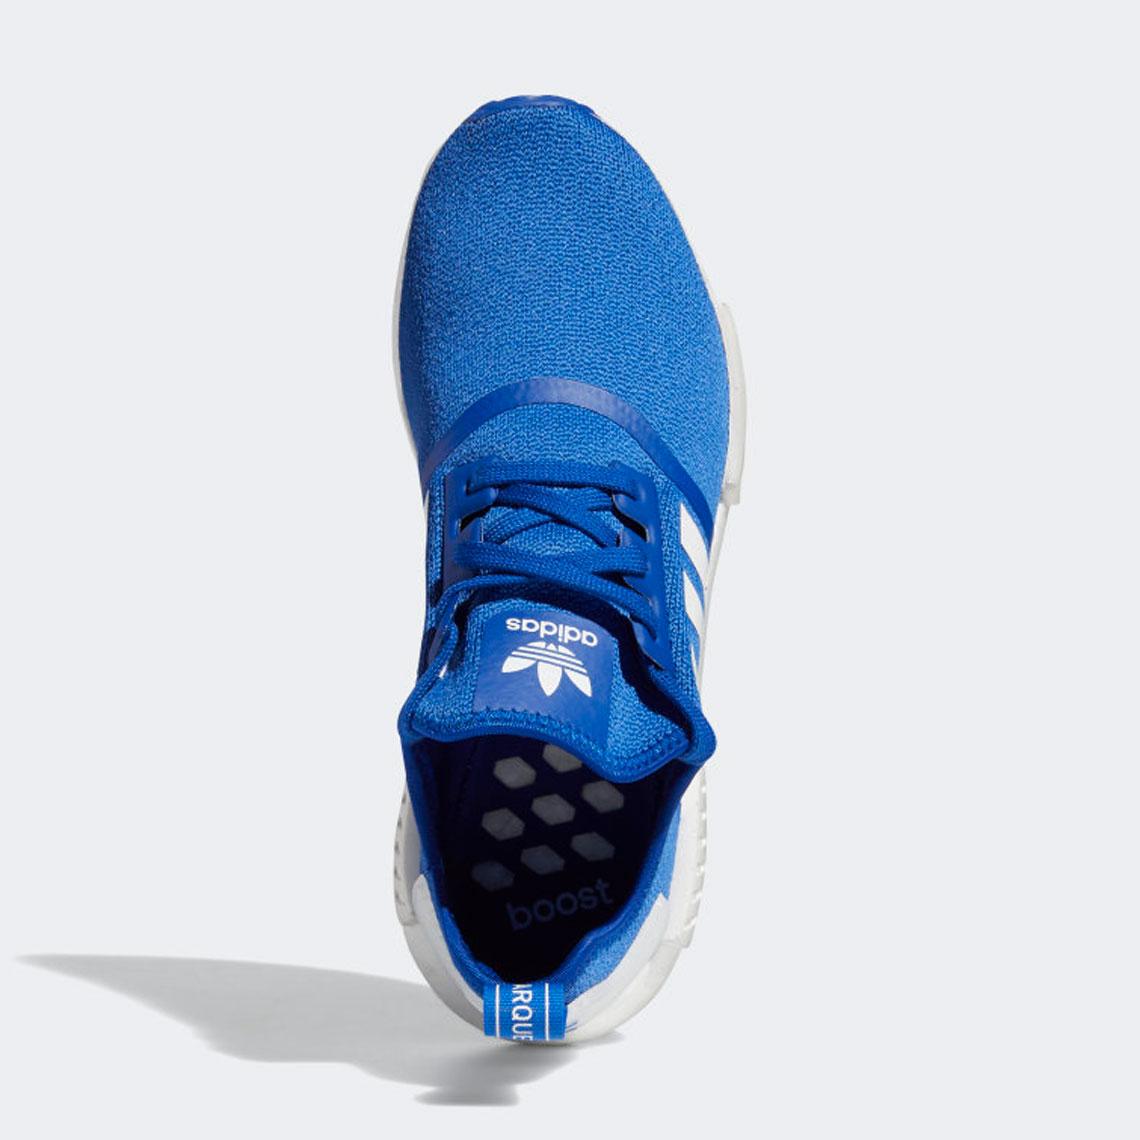 adidas NMD R1 Royal Blue FY9383 Release